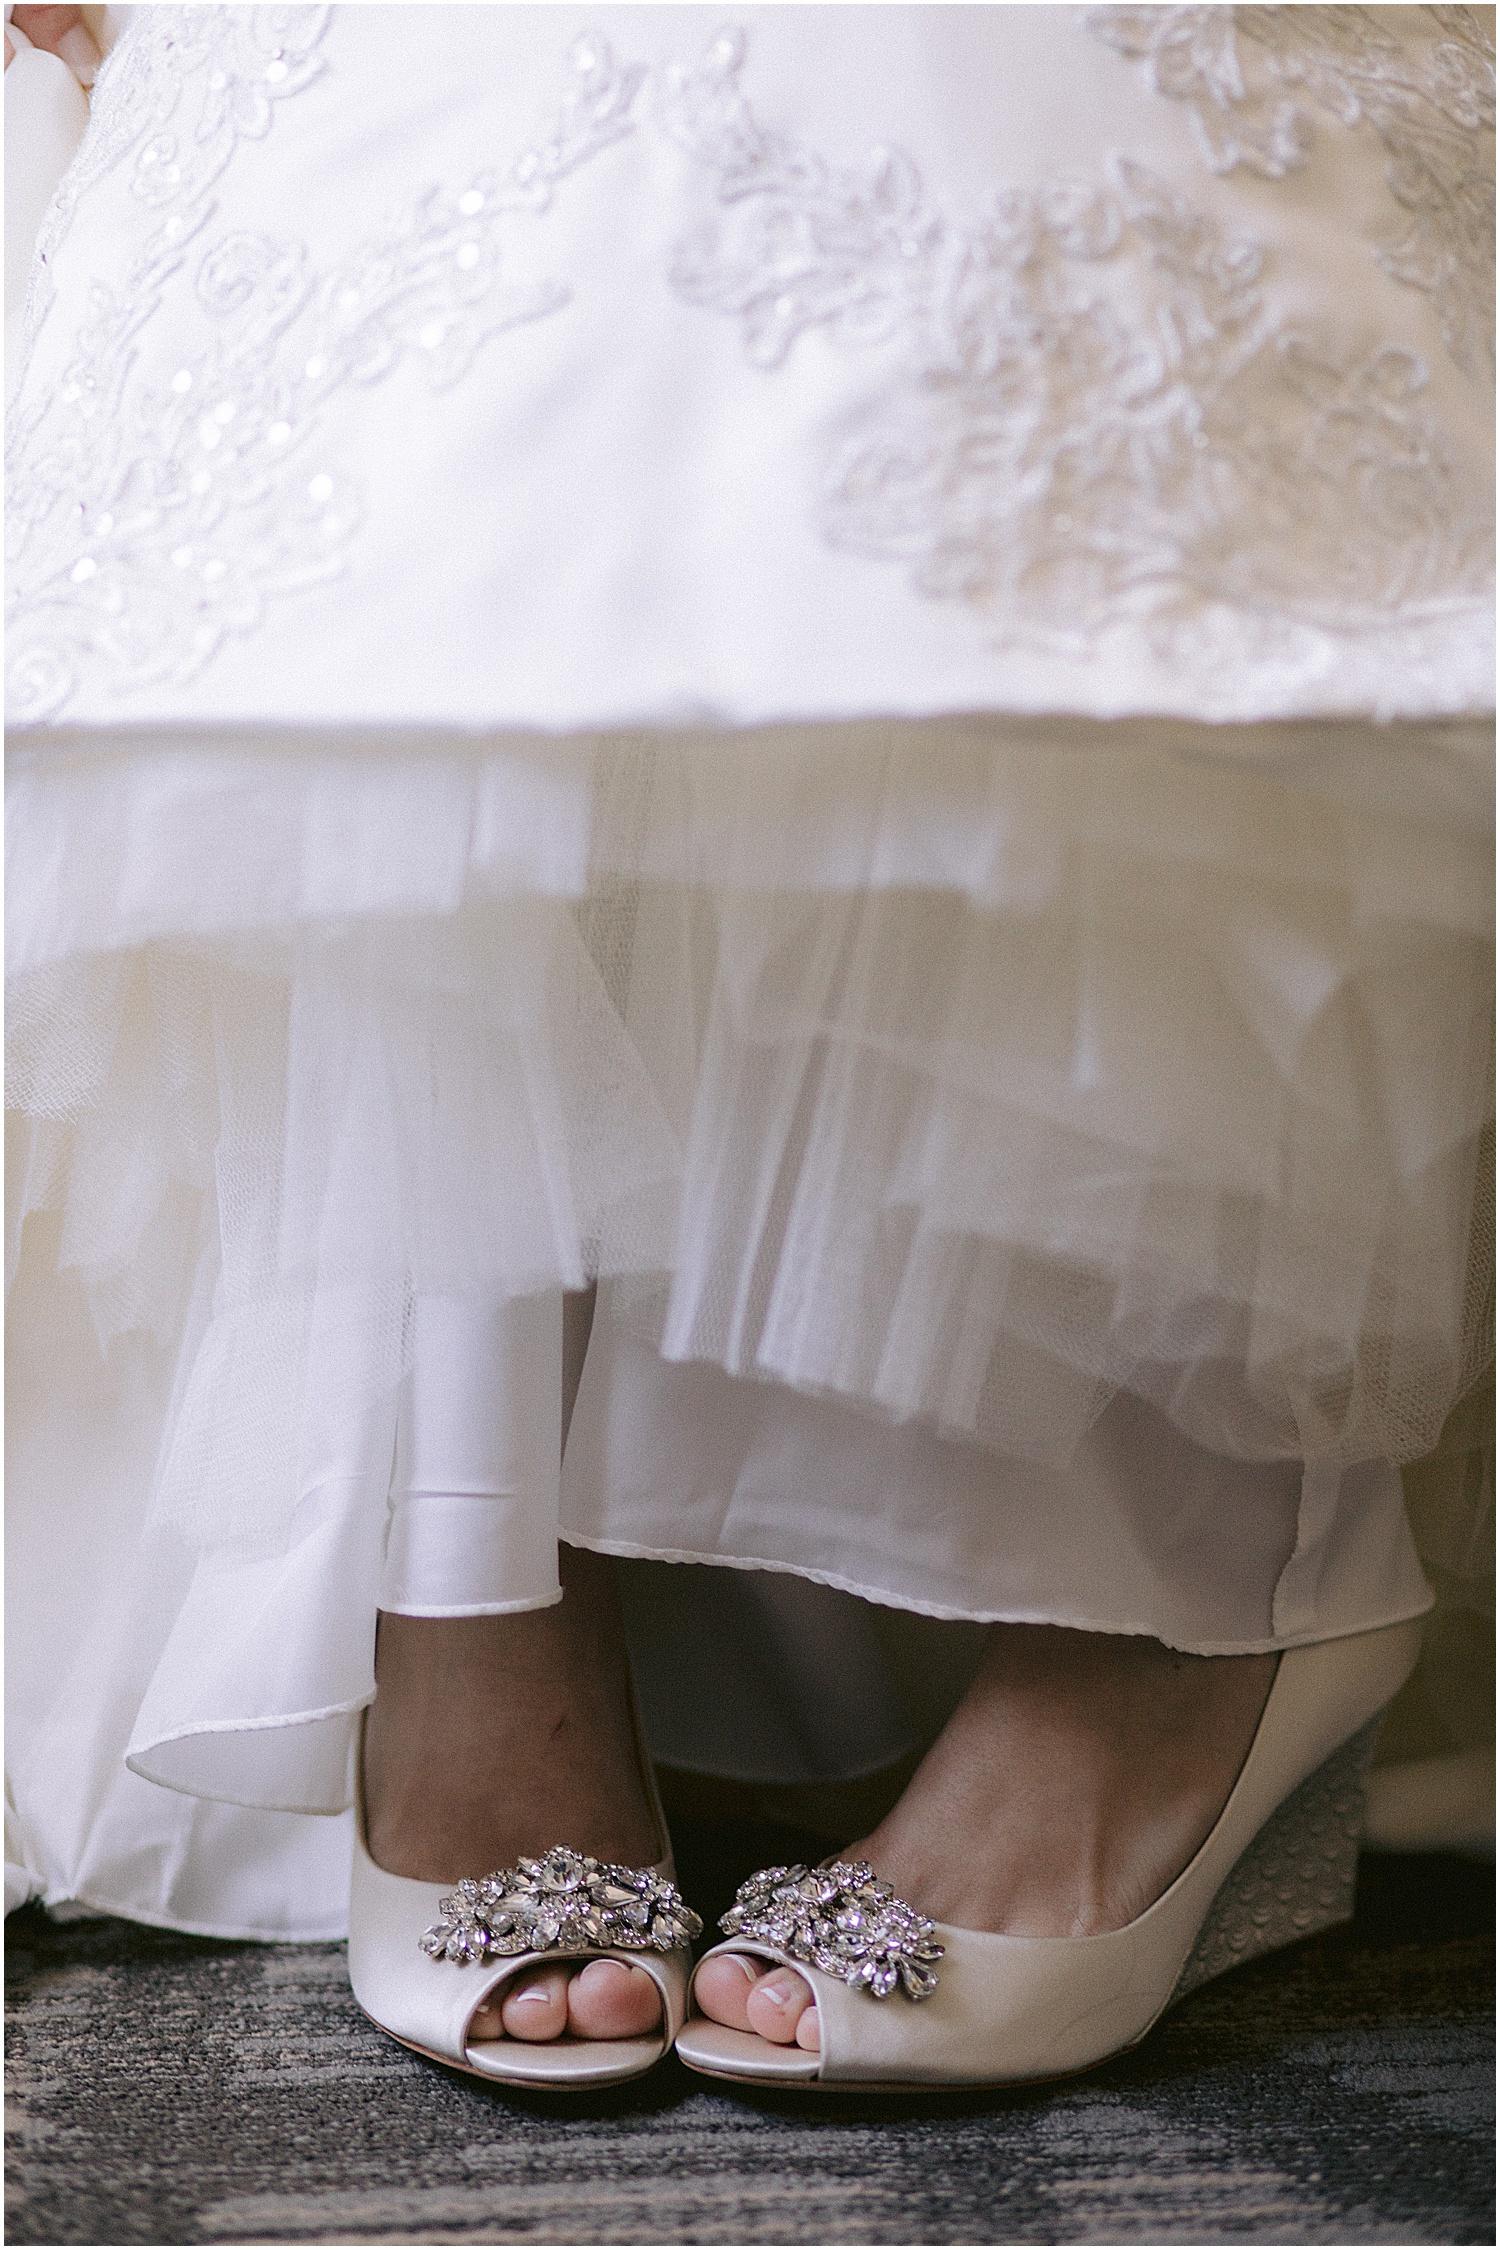 Badgley Mischka wedge shoes willoughby golf club wedding